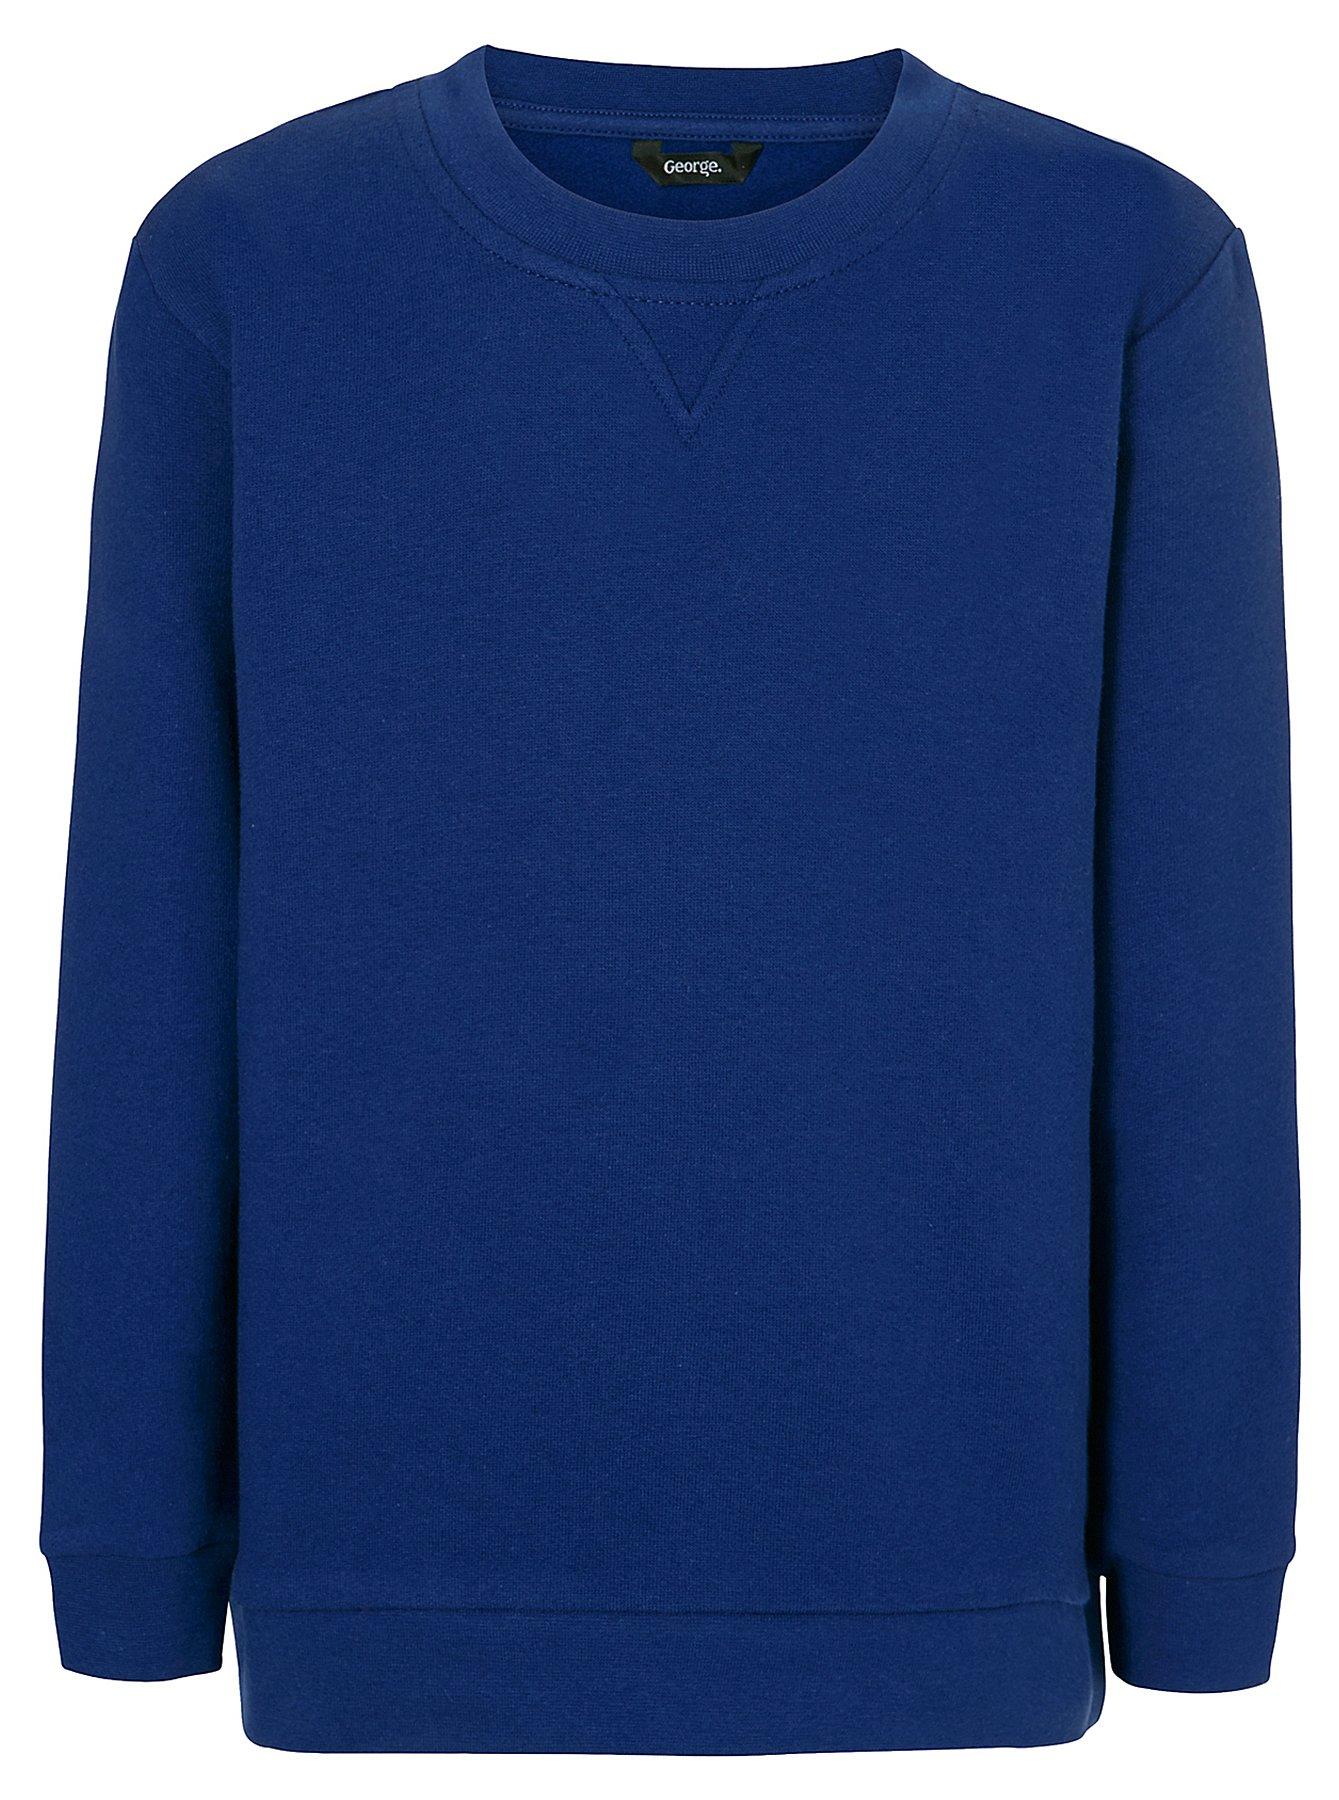 Cobalt Blue School Sweatshirt | School | George